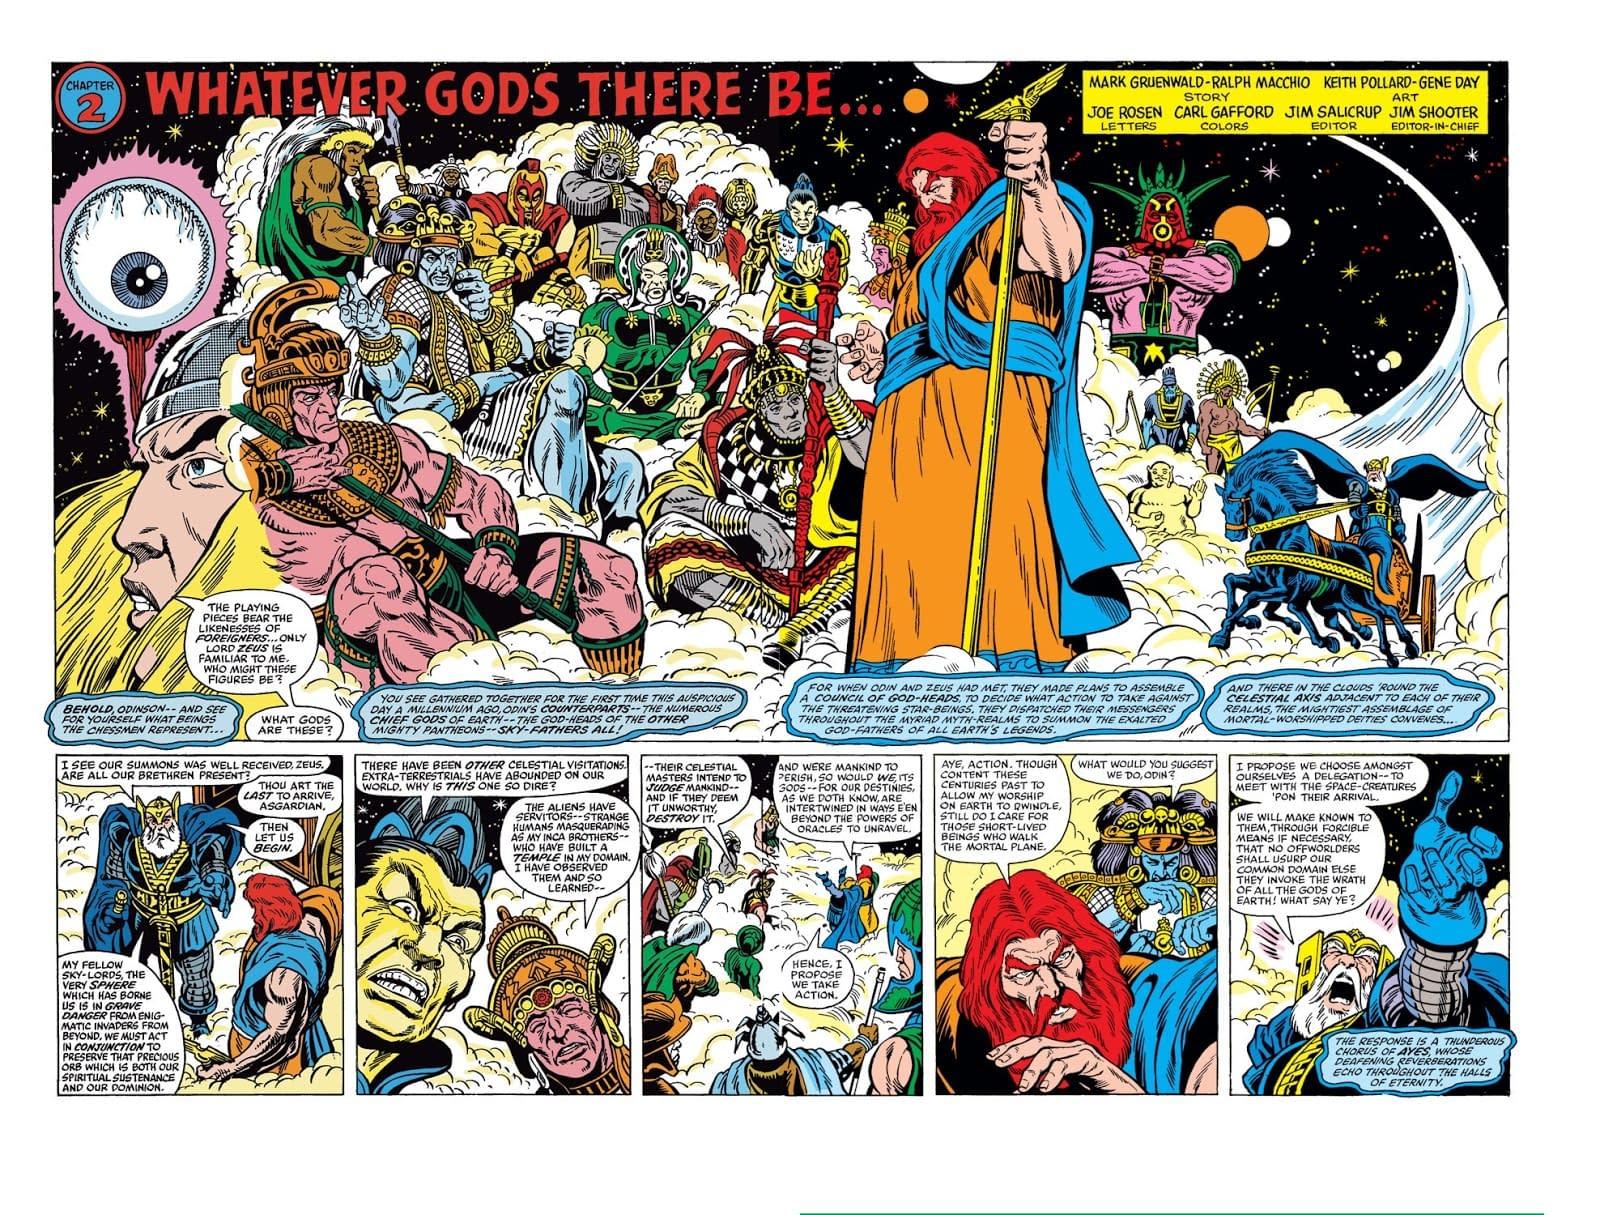 The Comic Book